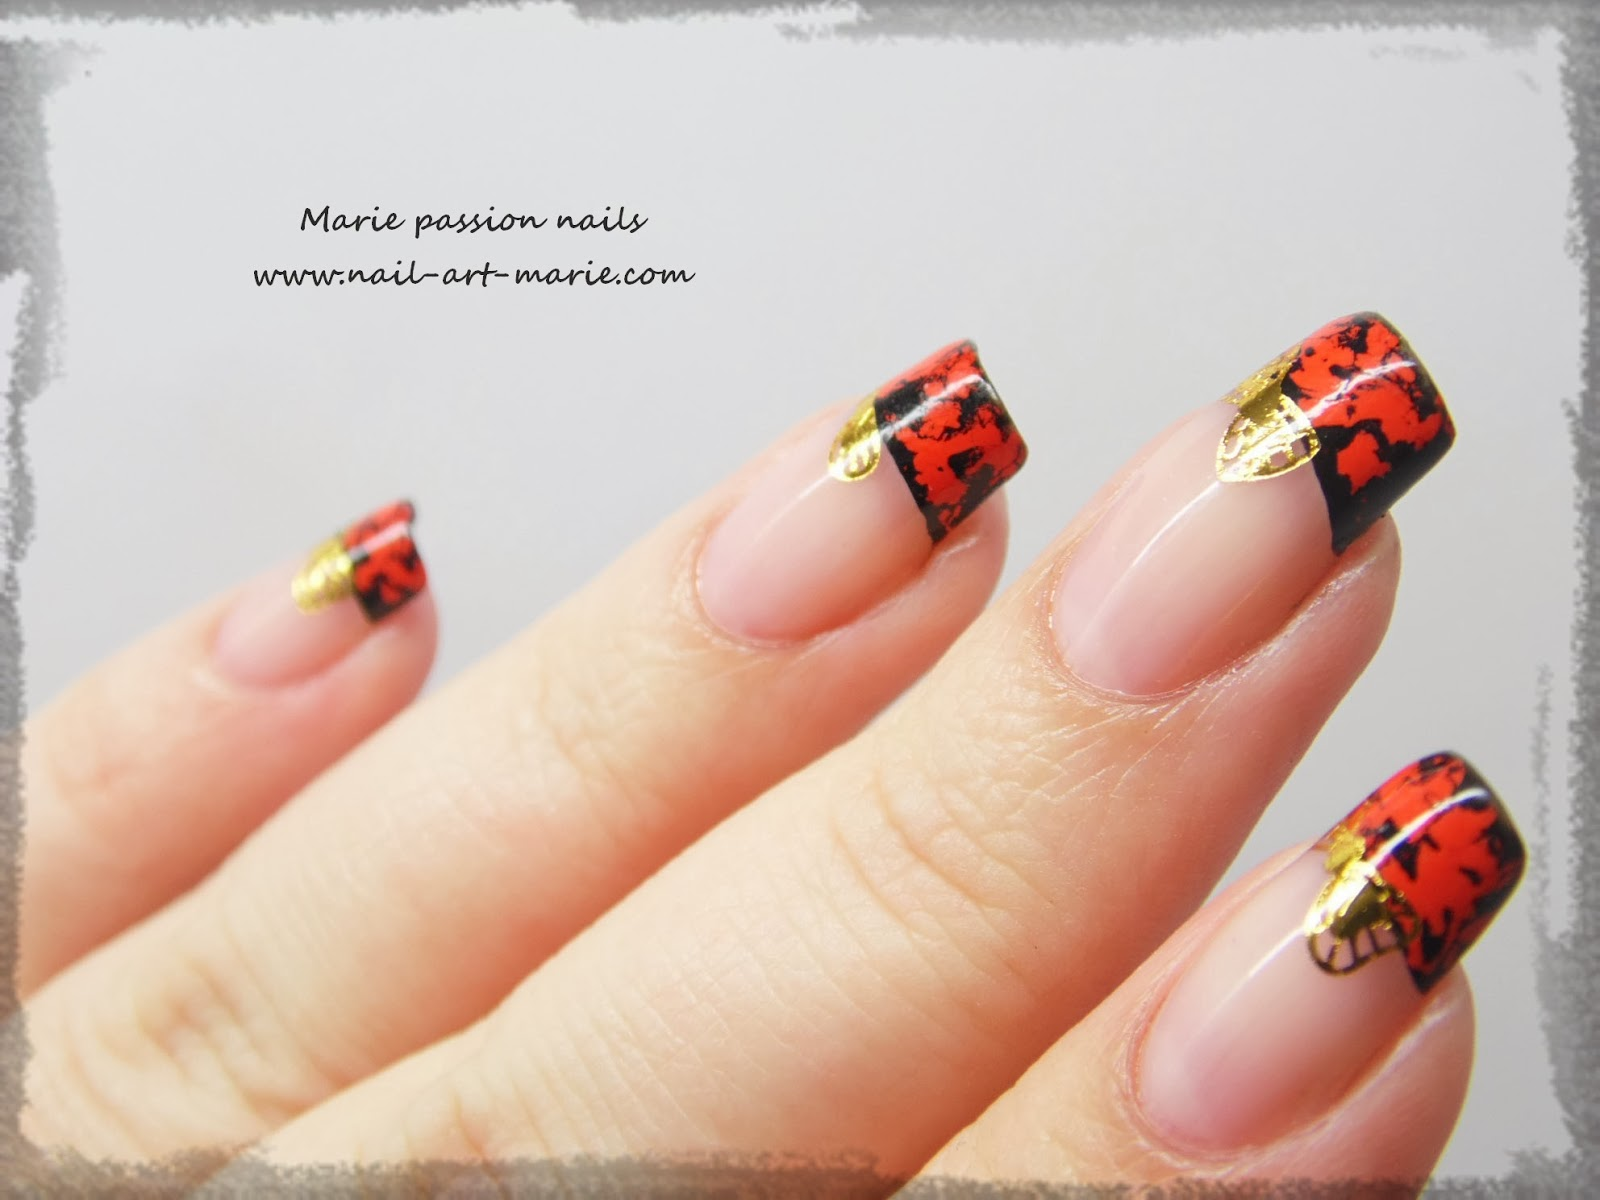 Nail Art avec craquelures de foils matte7